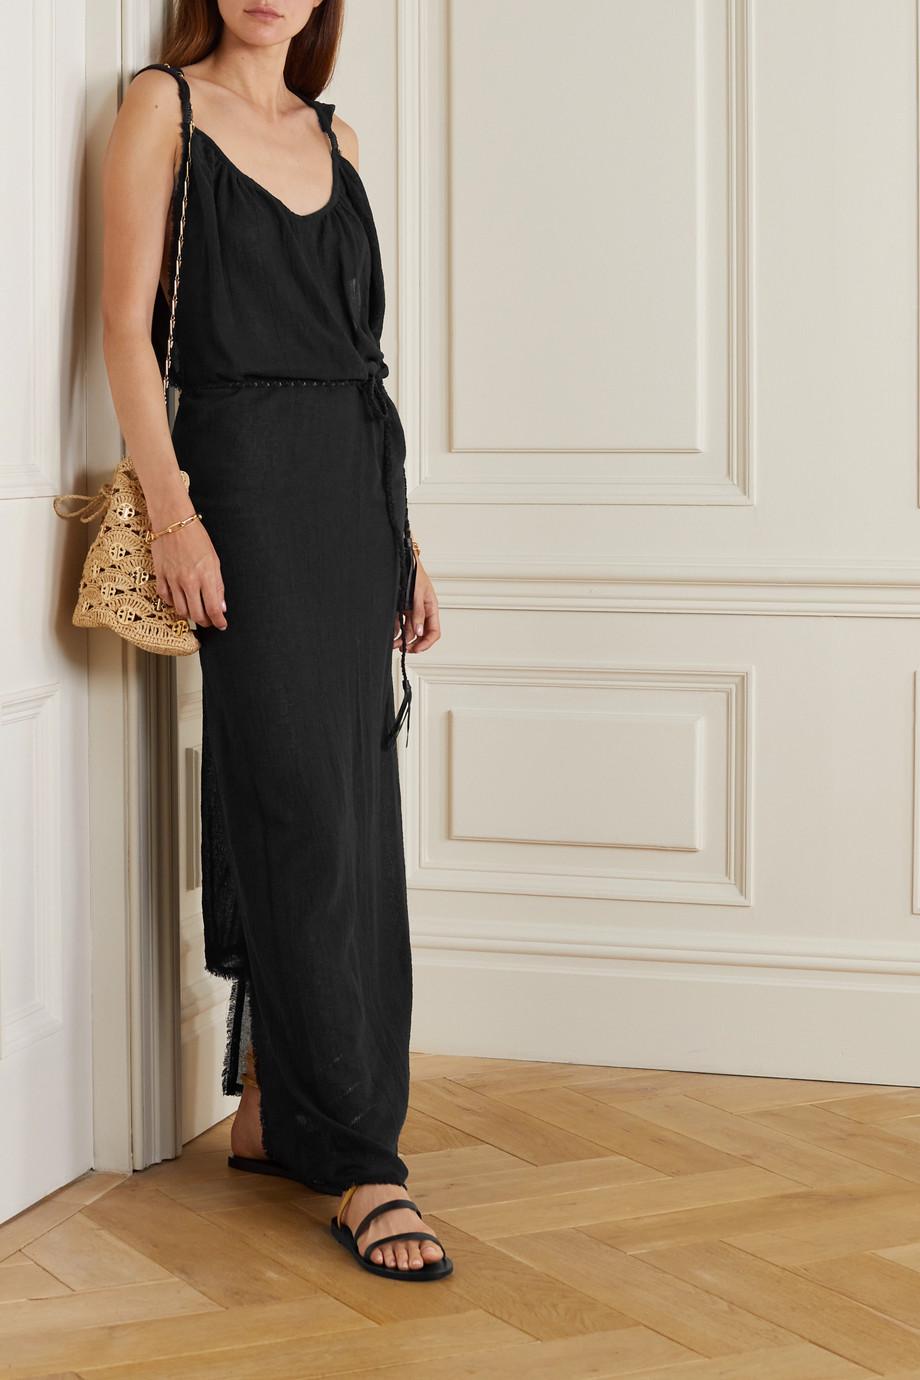 Caravana + NET SUSTAIN Muuk leather-trimmed cotton-gauze dress